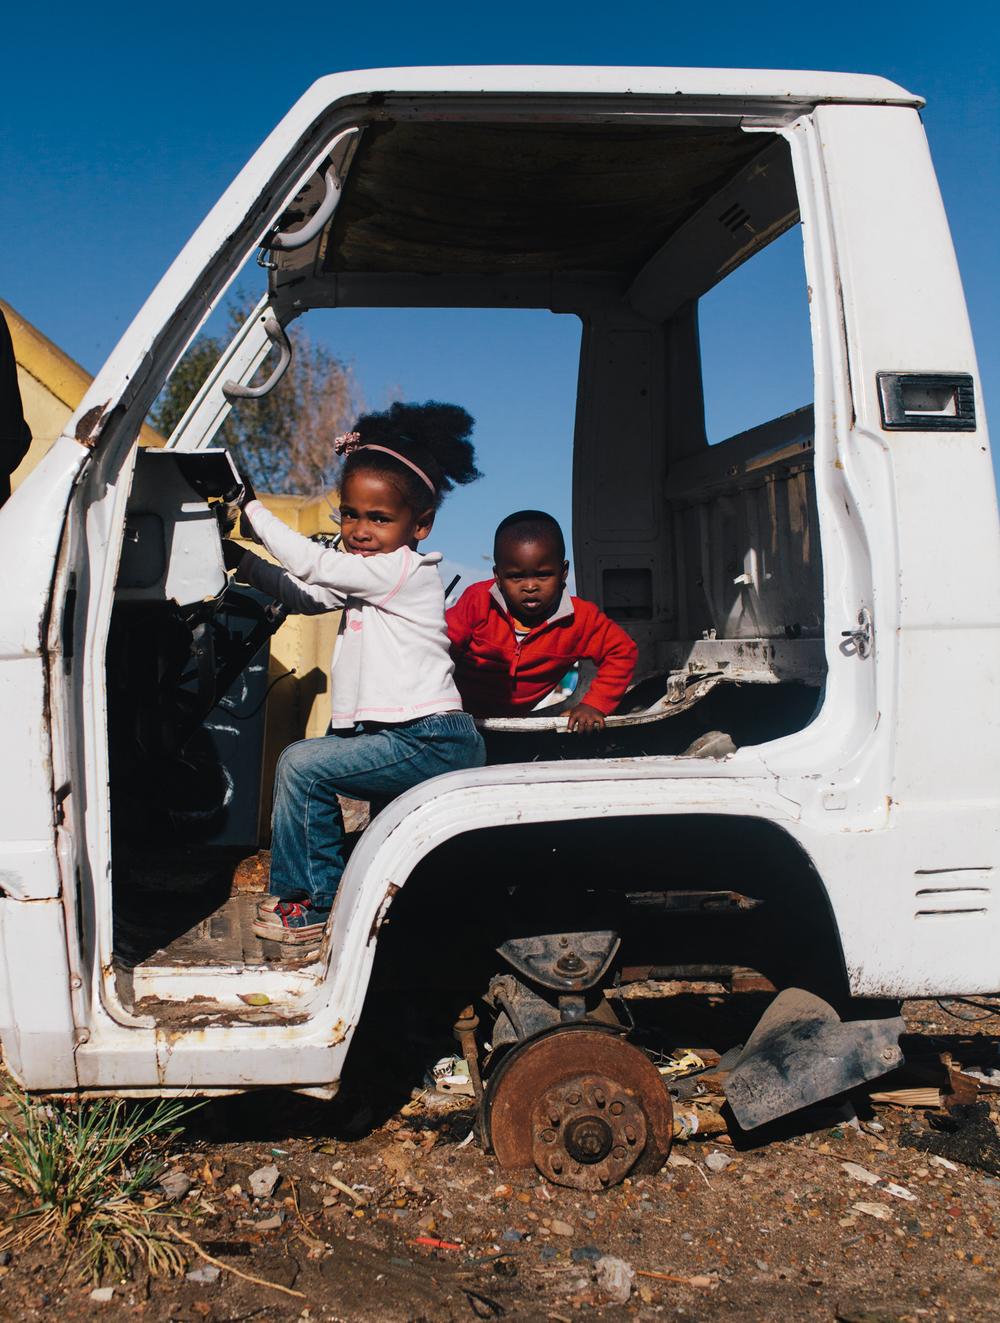 South_Africa_0422.jpg